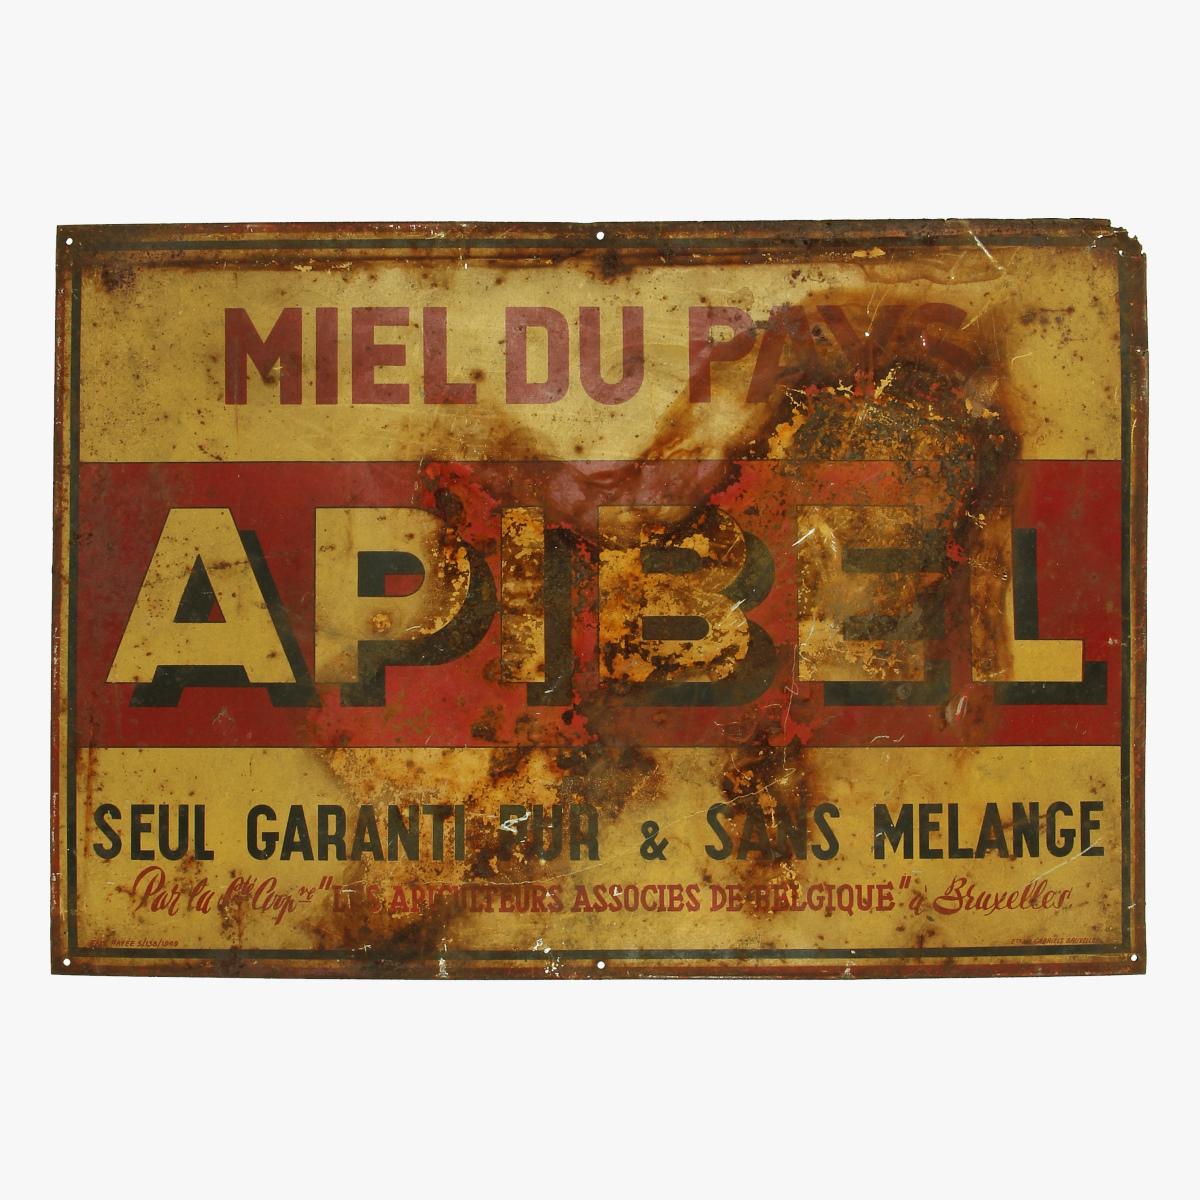 Afbeeldingen van blikken reclame bord 1949 miel du pays APIBEL Seul garanti pur & sans melange